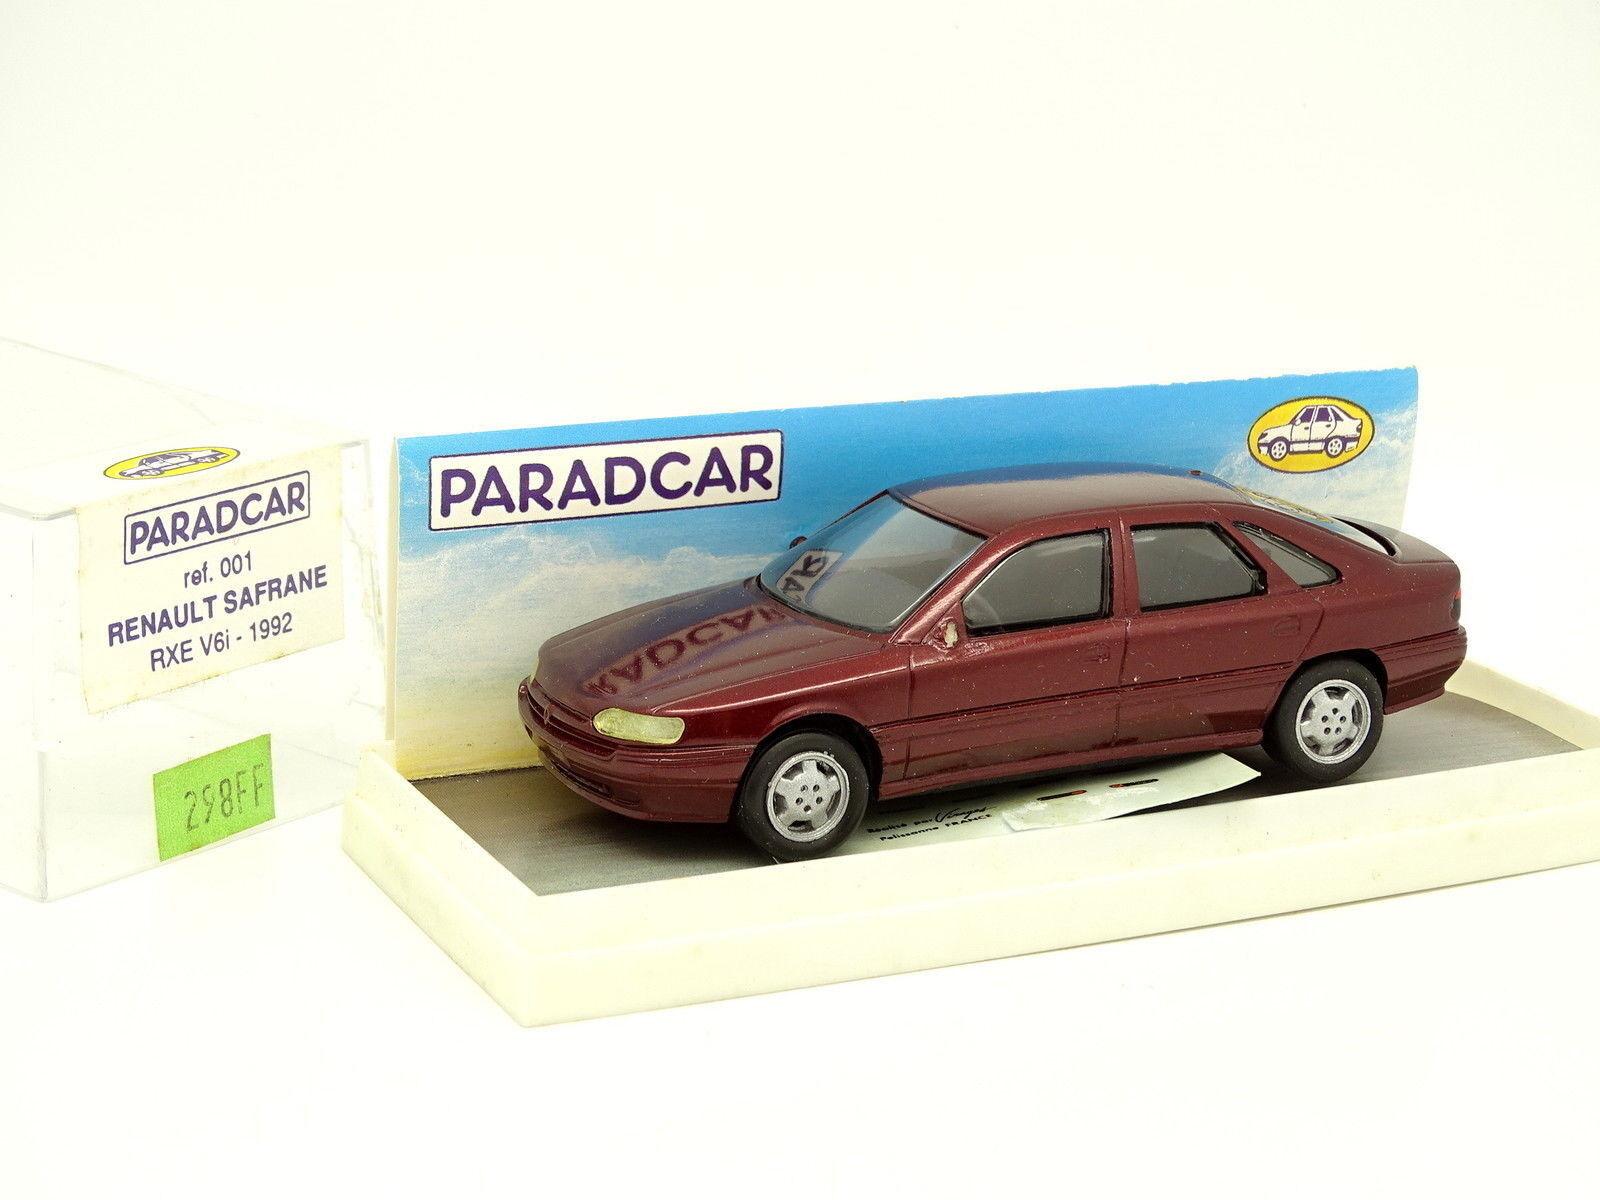 Paradcar Resin 1 43 - Renault Safrane rxe v6 Red